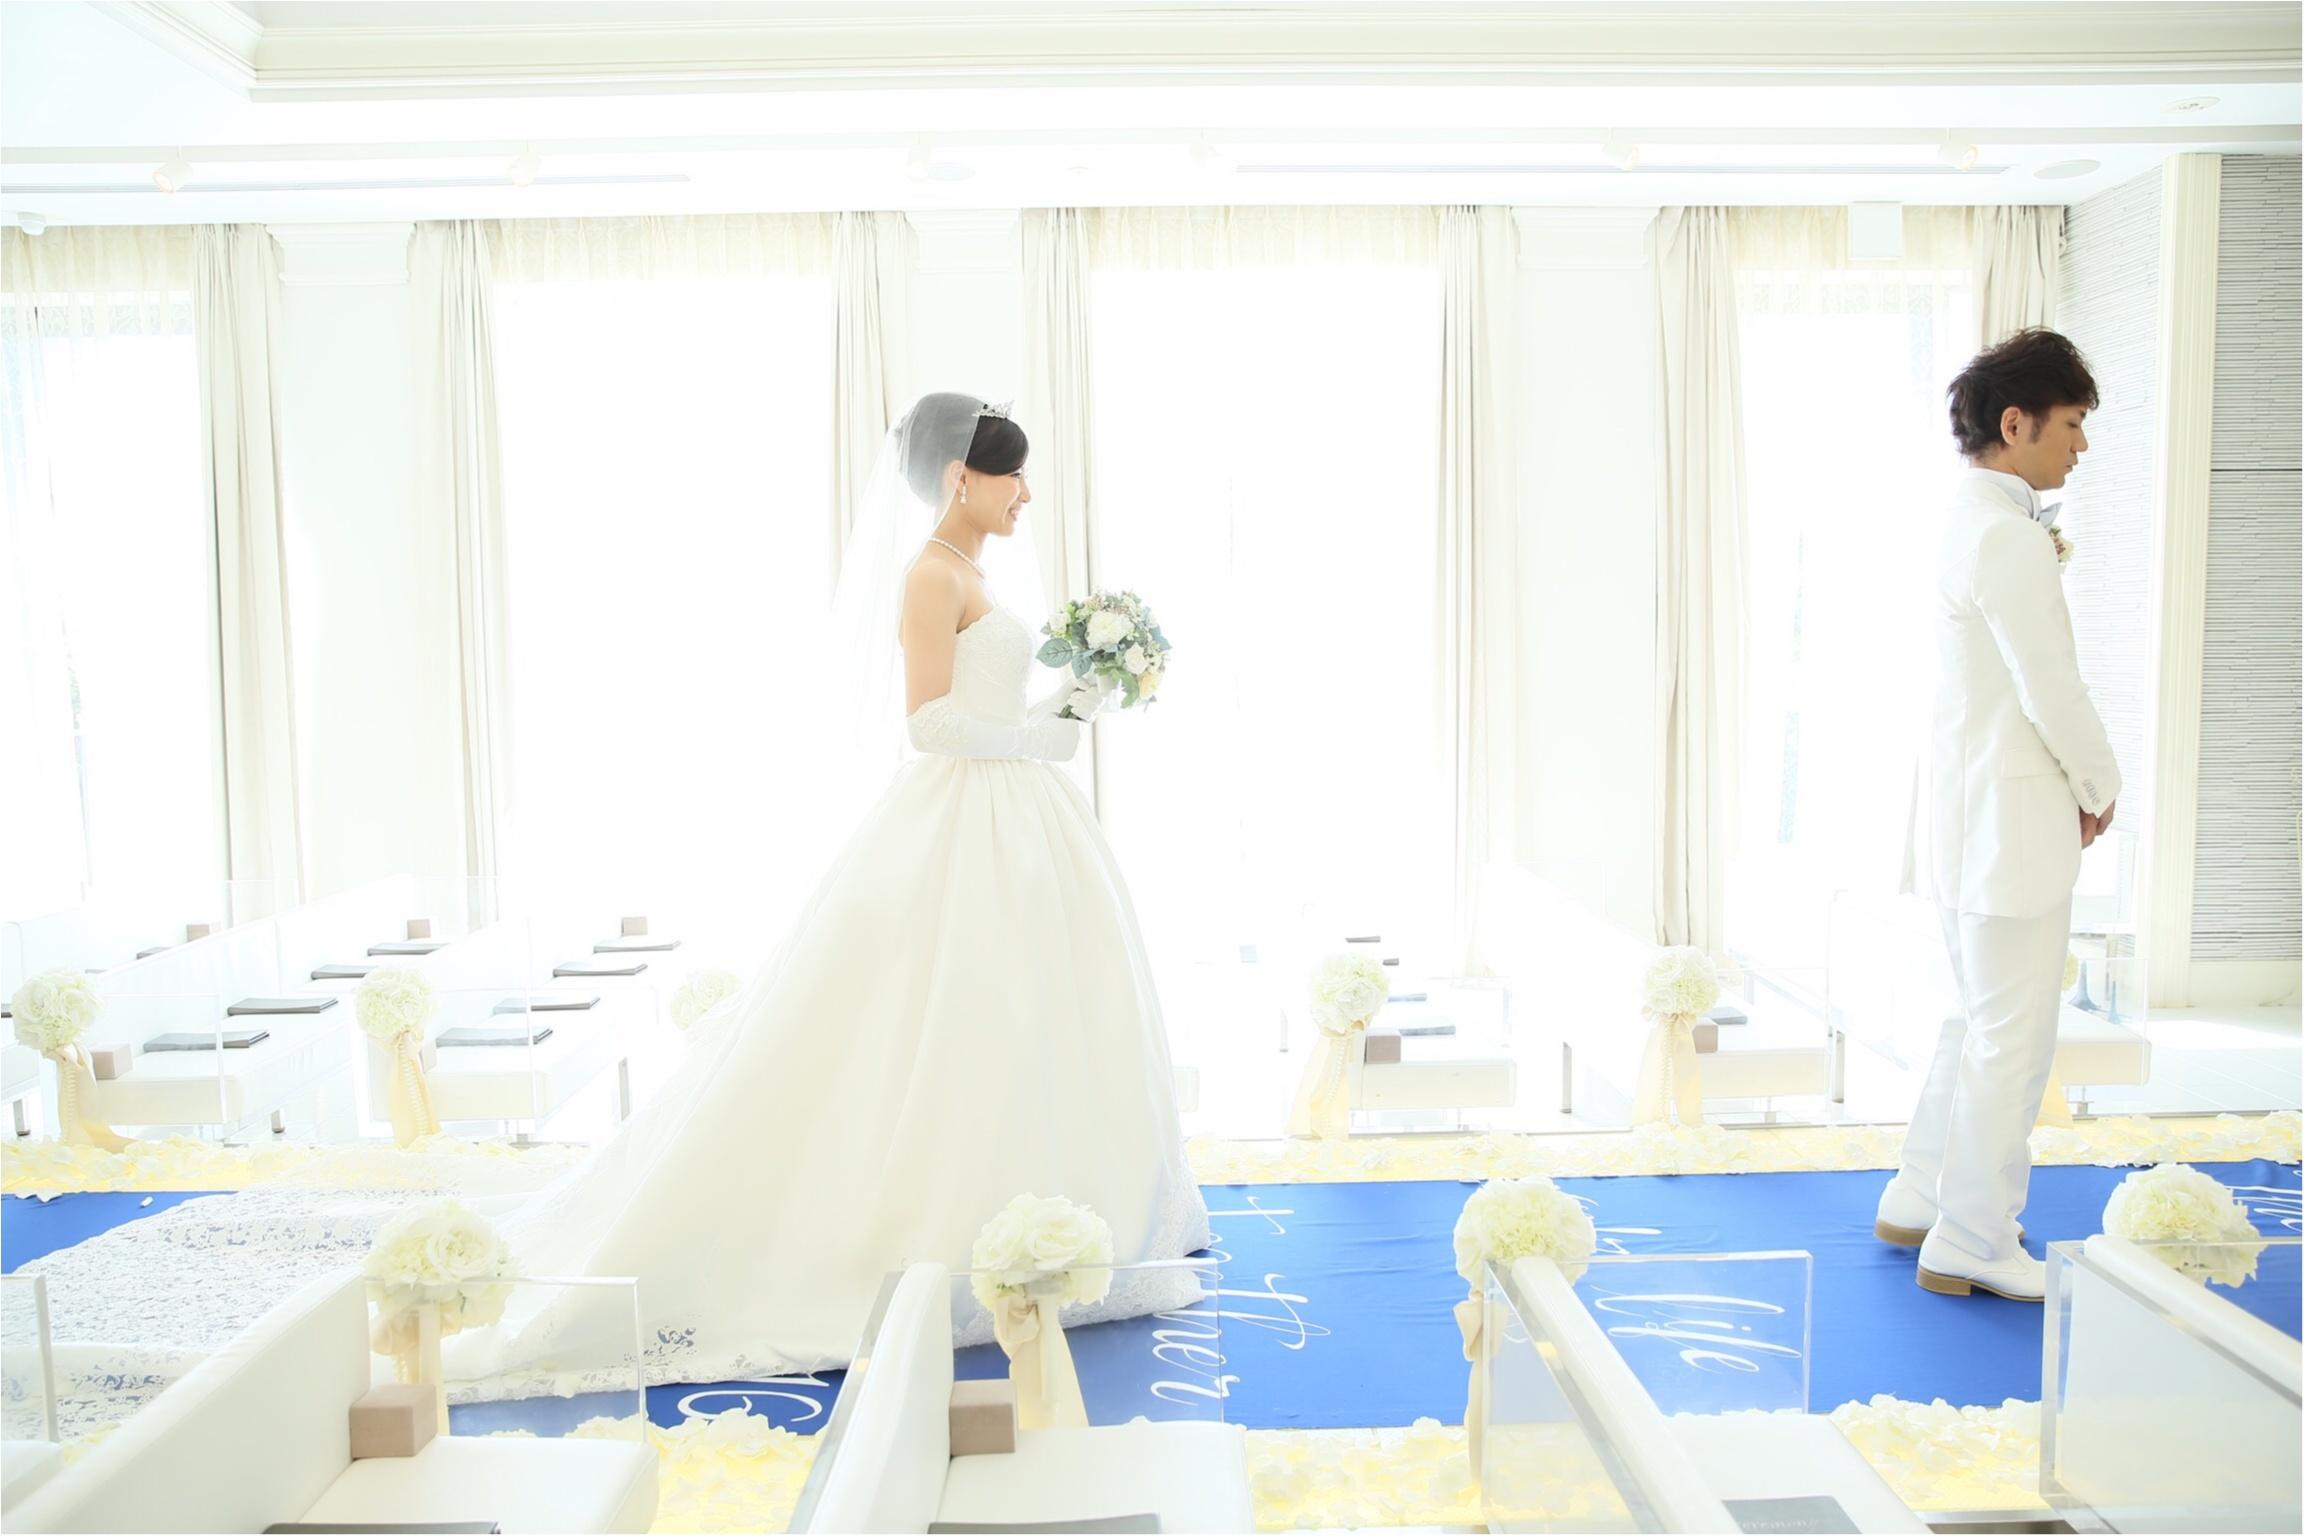 moco婚②▶︎まずは、ドキドキのファーストミート♡♡そこでなんと……_2